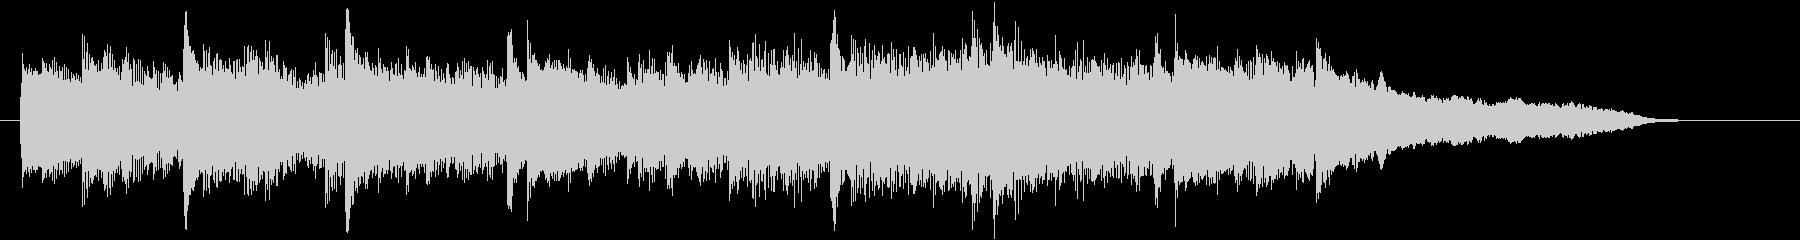 CM15秒、感動的なアコギとストリングスの未再生の波形